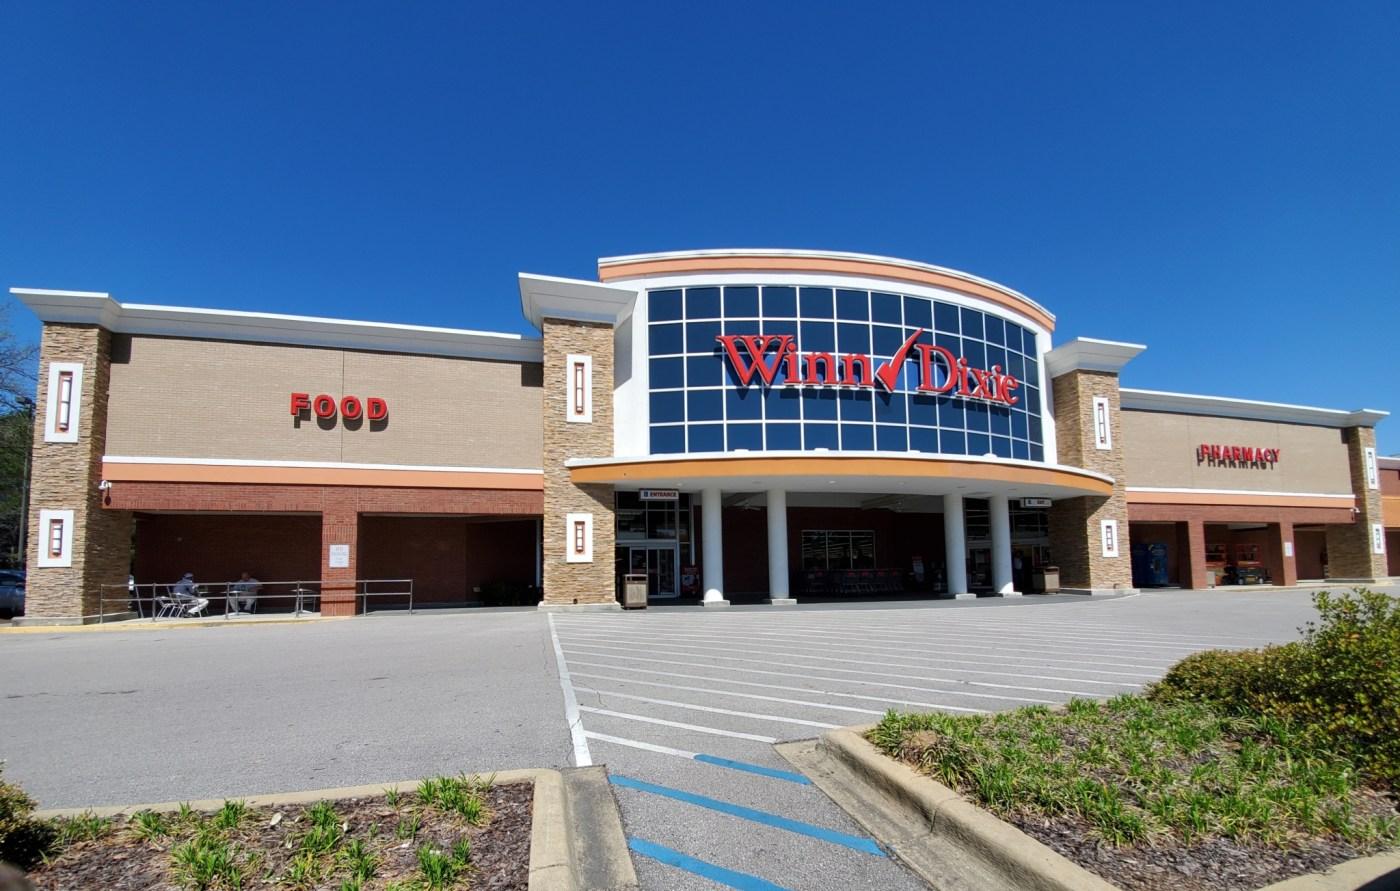 Winn Dixie store front